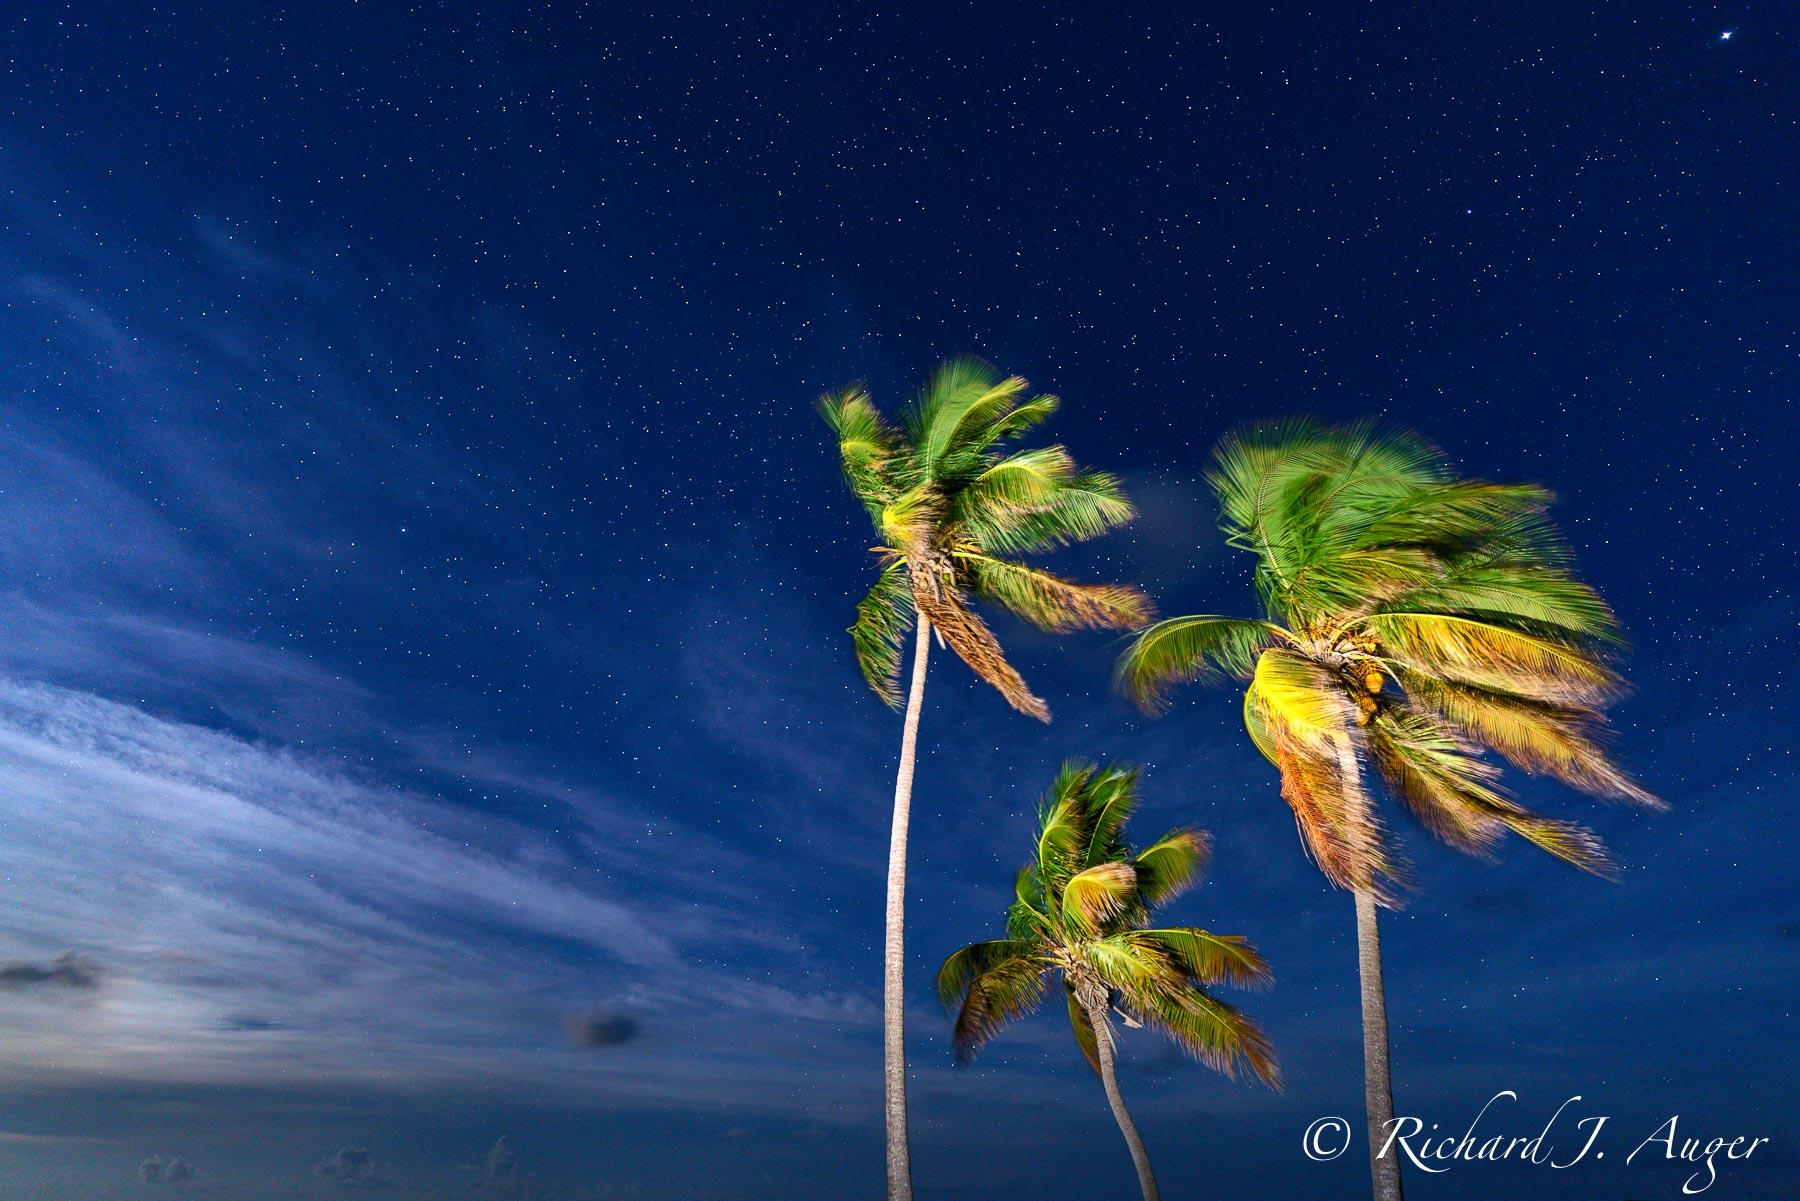 Florida Keys, Palm Trees, Bahia Honda, Key West, Midnight, Stars, Lighting, Blue